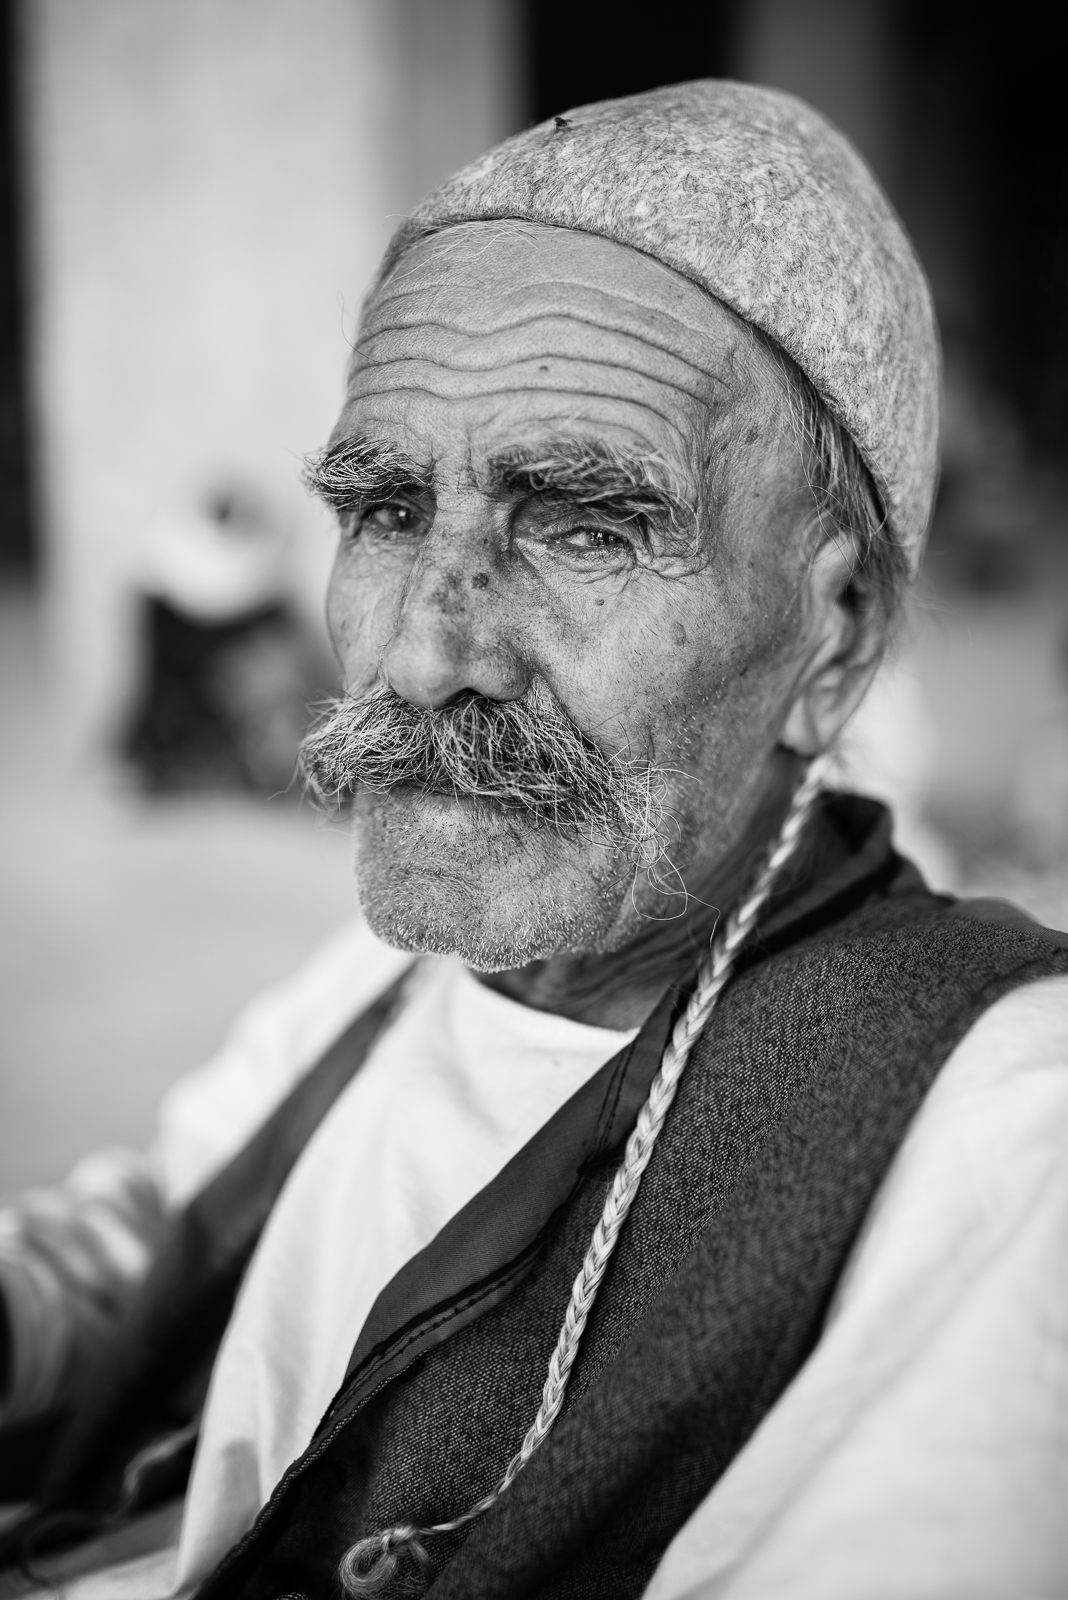 Yazidi old man in Zakho under constructionbuilding